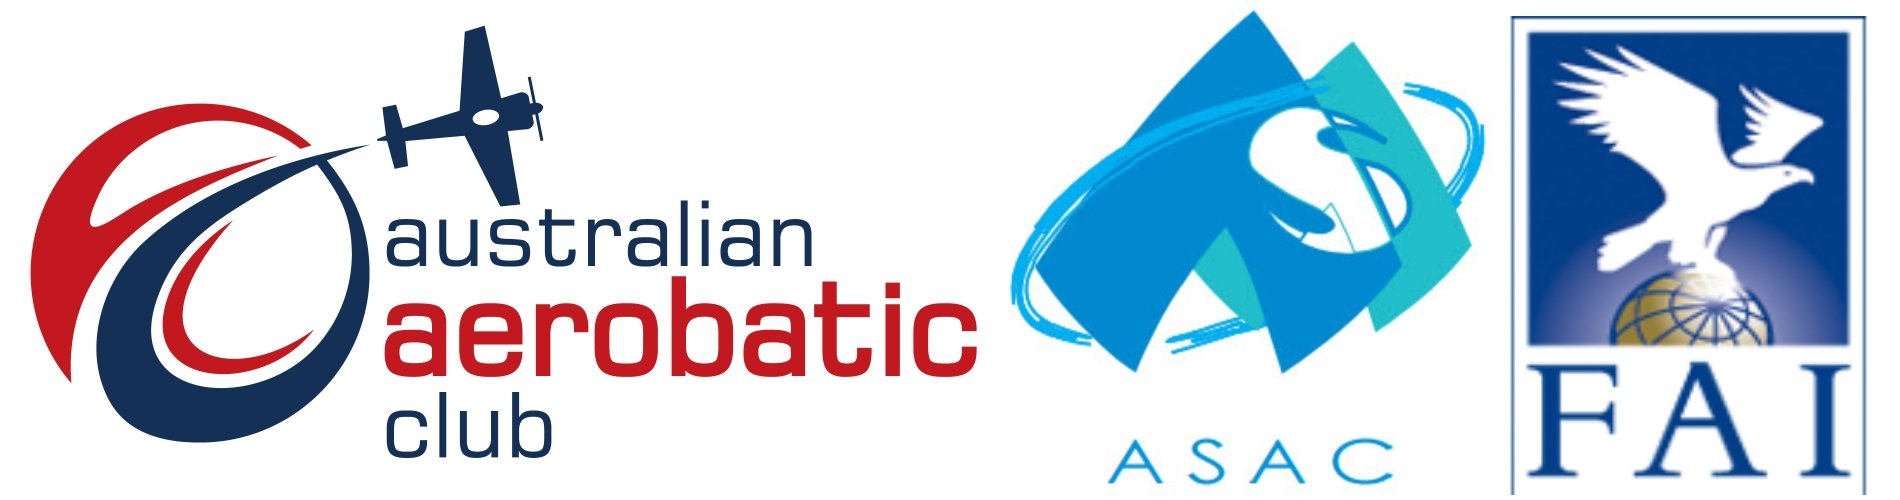 Australian Aerobatic Club